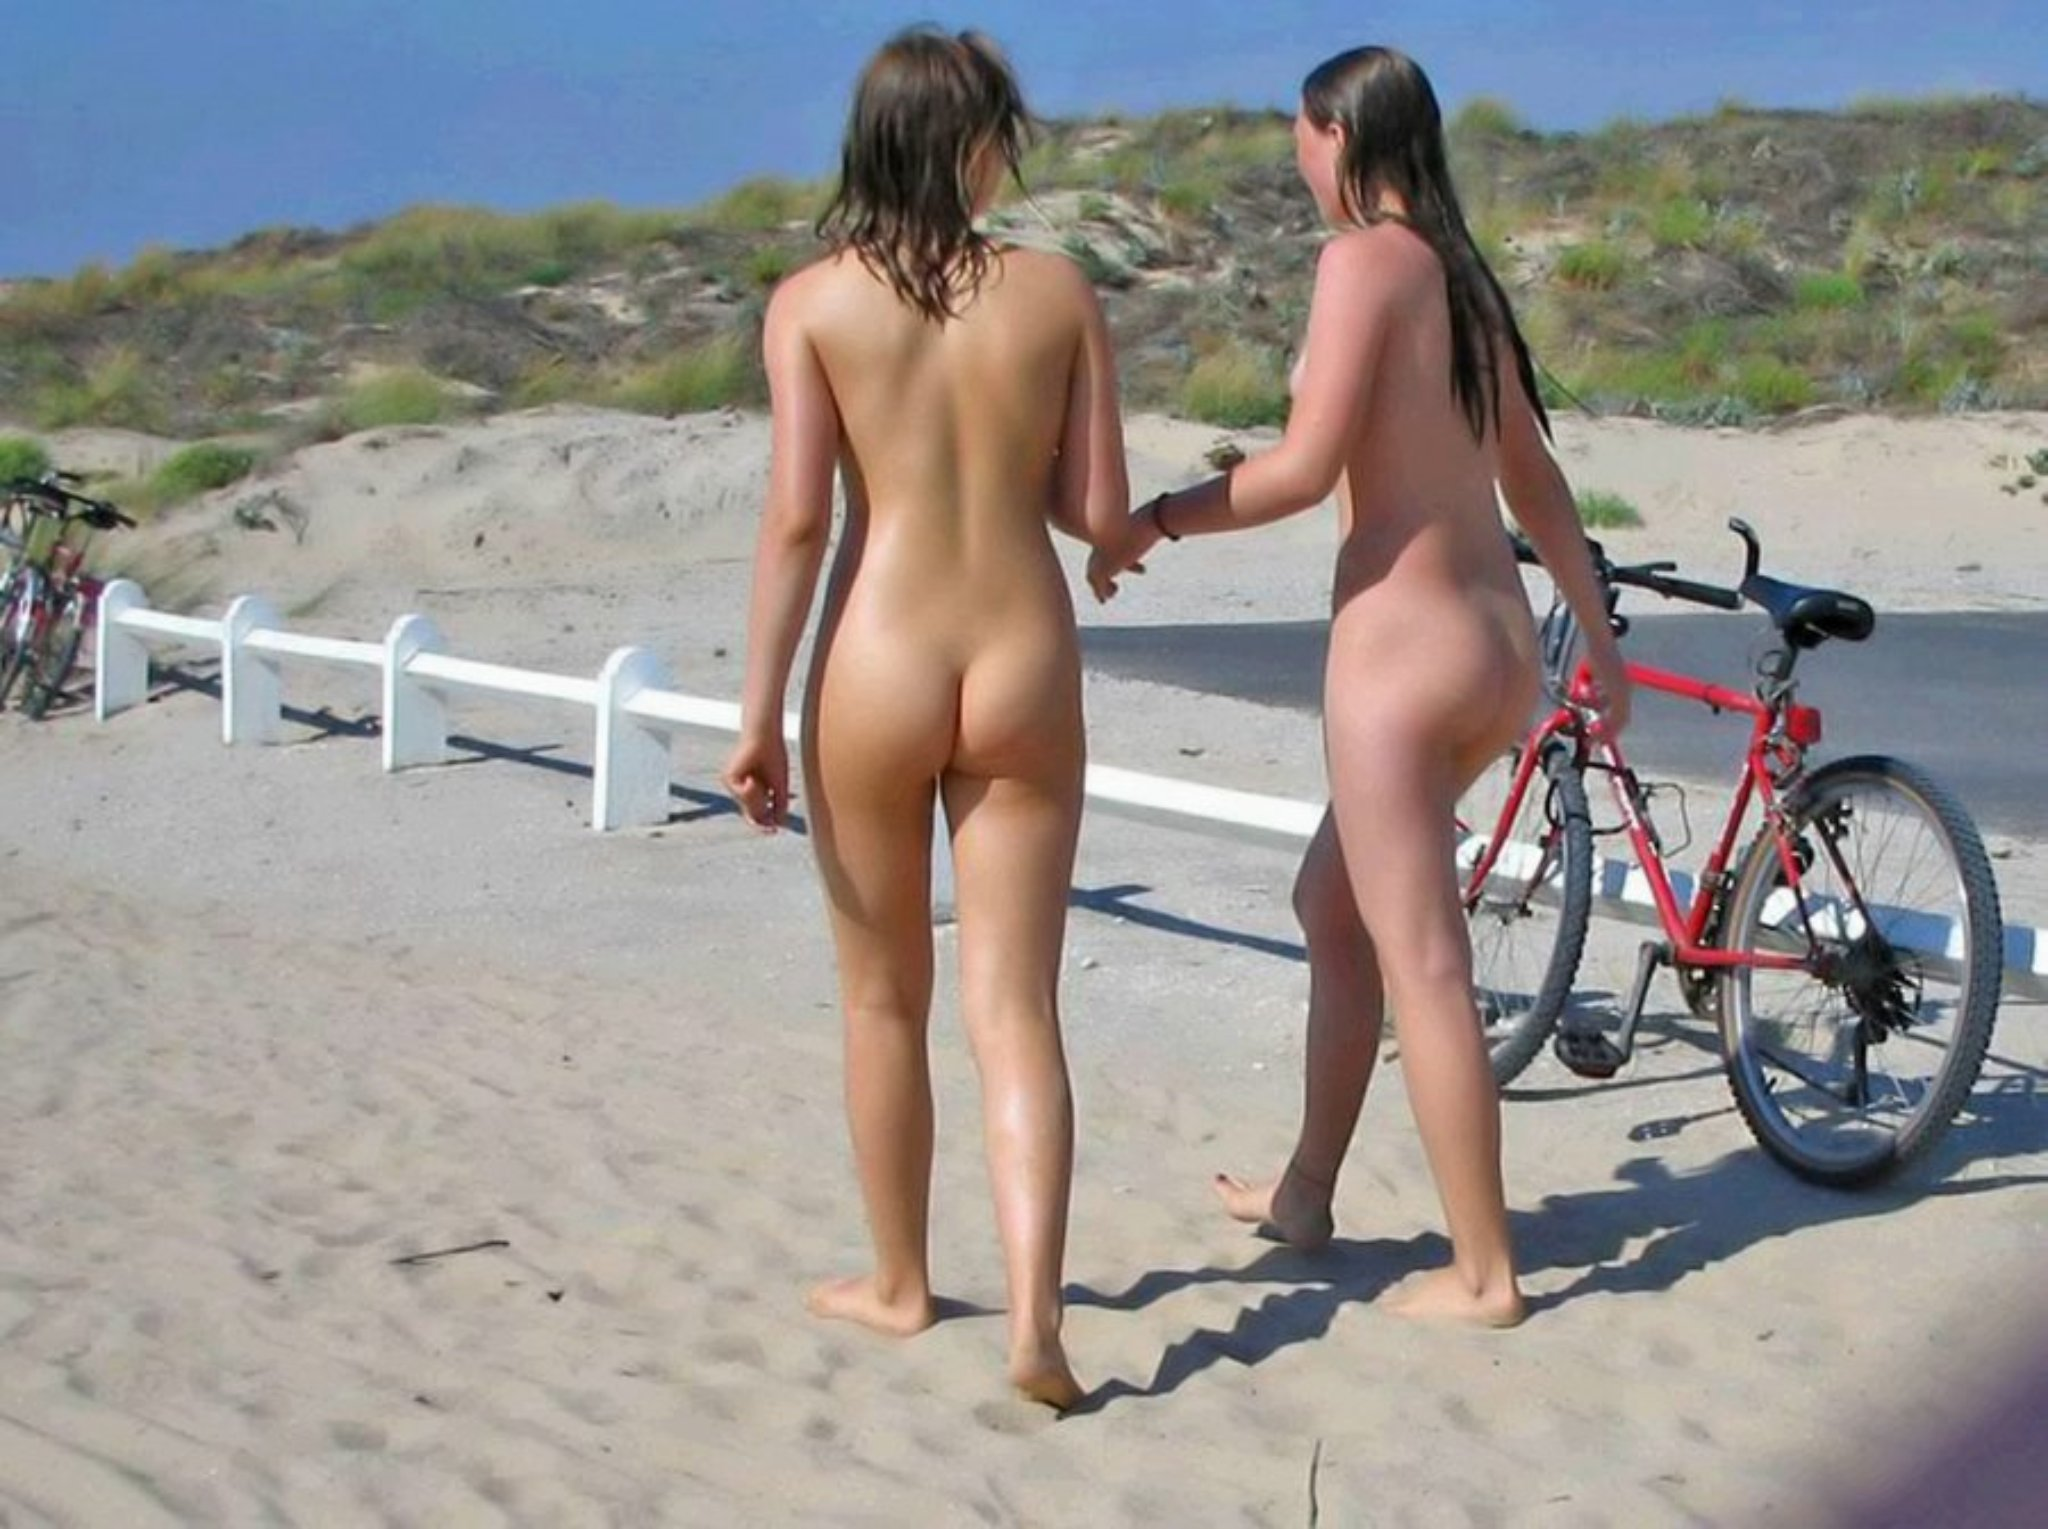 Nudist teens after a cooling swim in ocean